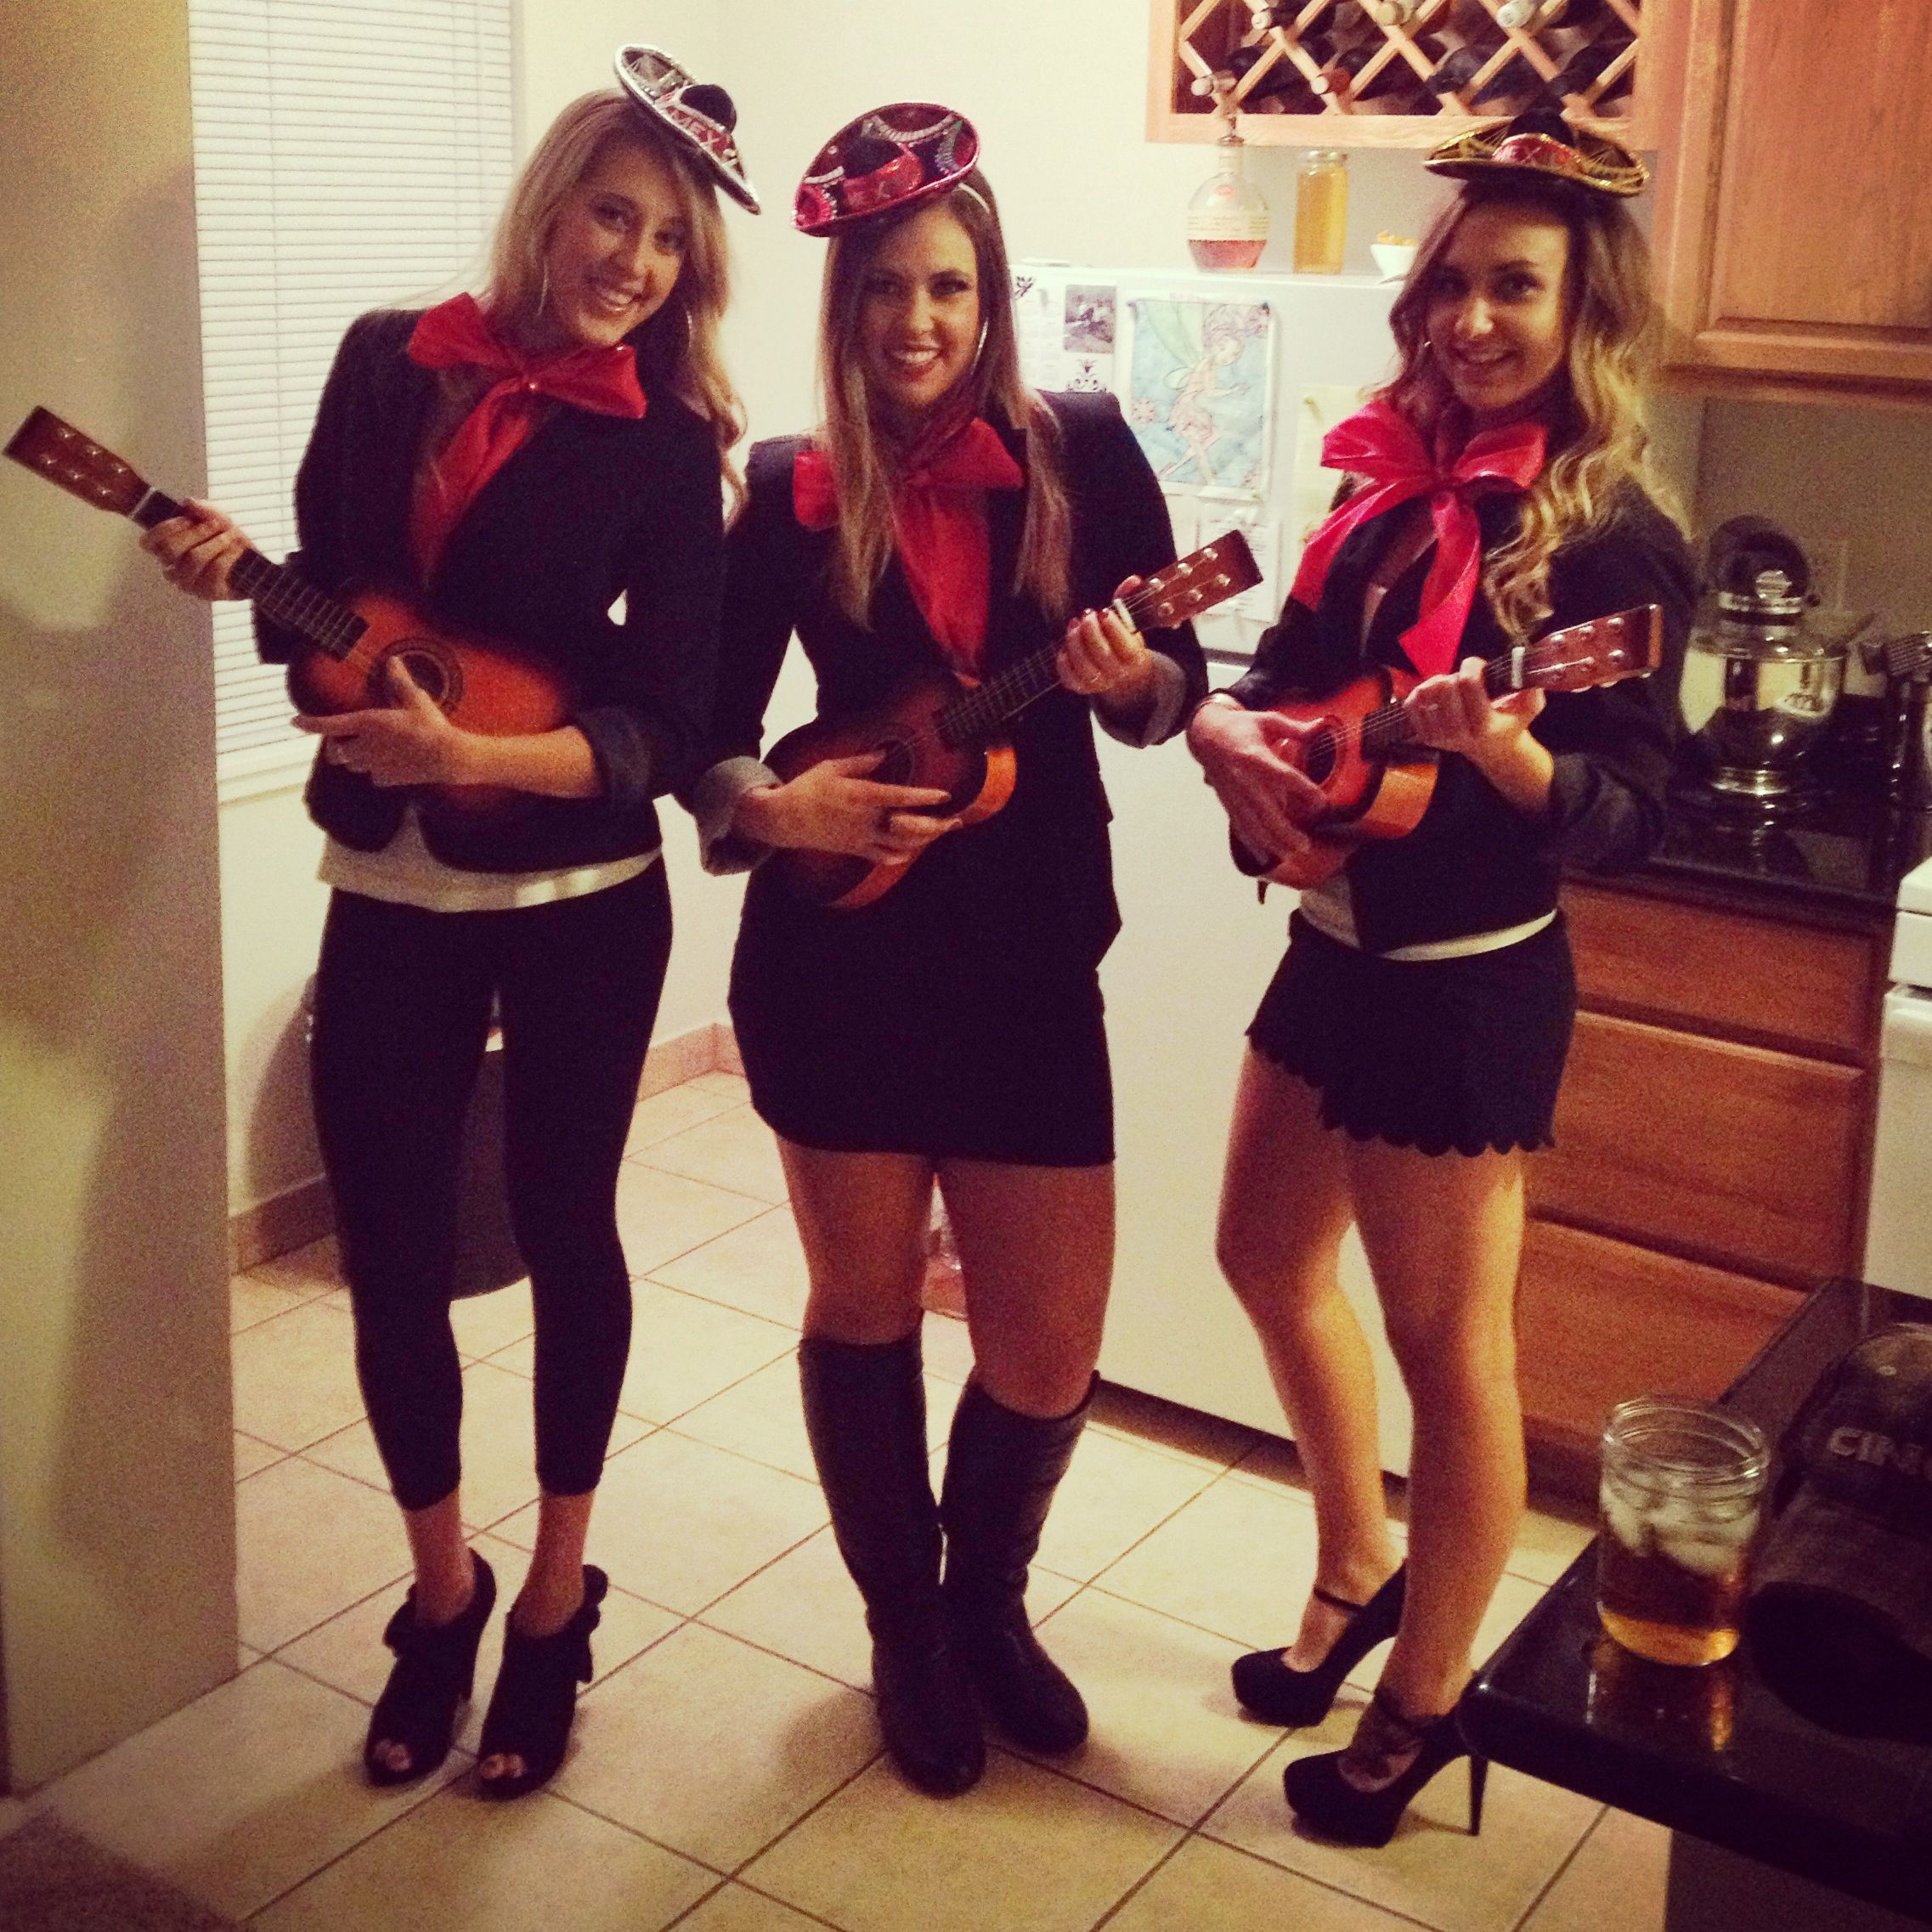 homemade mariachi halloween costumes - Band Halloween Costumes